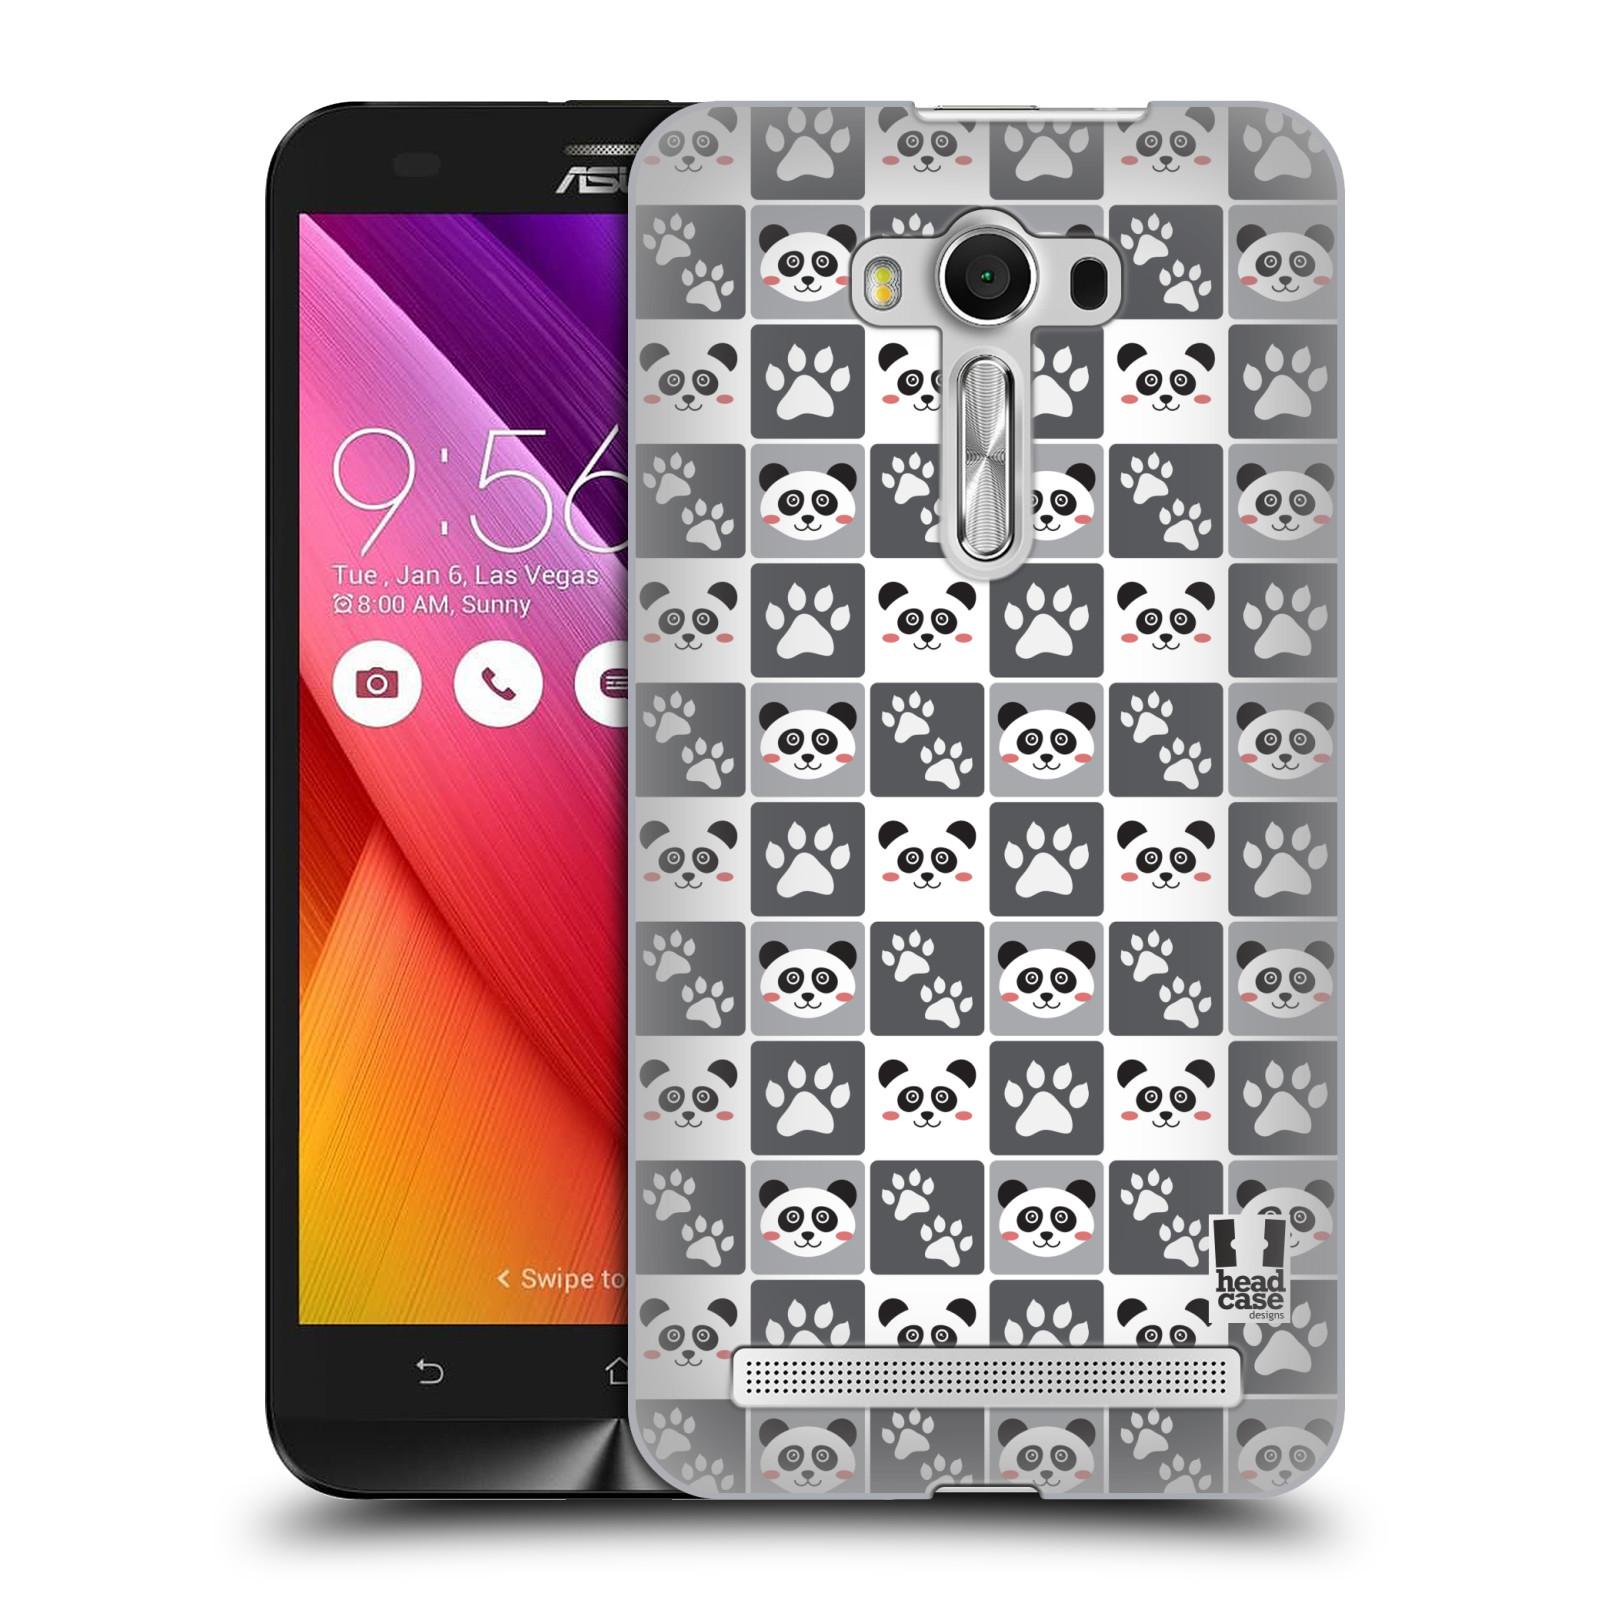 HEAD CASE plastový obal na mobil Asus Zenfone 2 LASER (5,5 displej ZE550KL) vzor Zvířecí razítka MEDVÍDEK PANDA